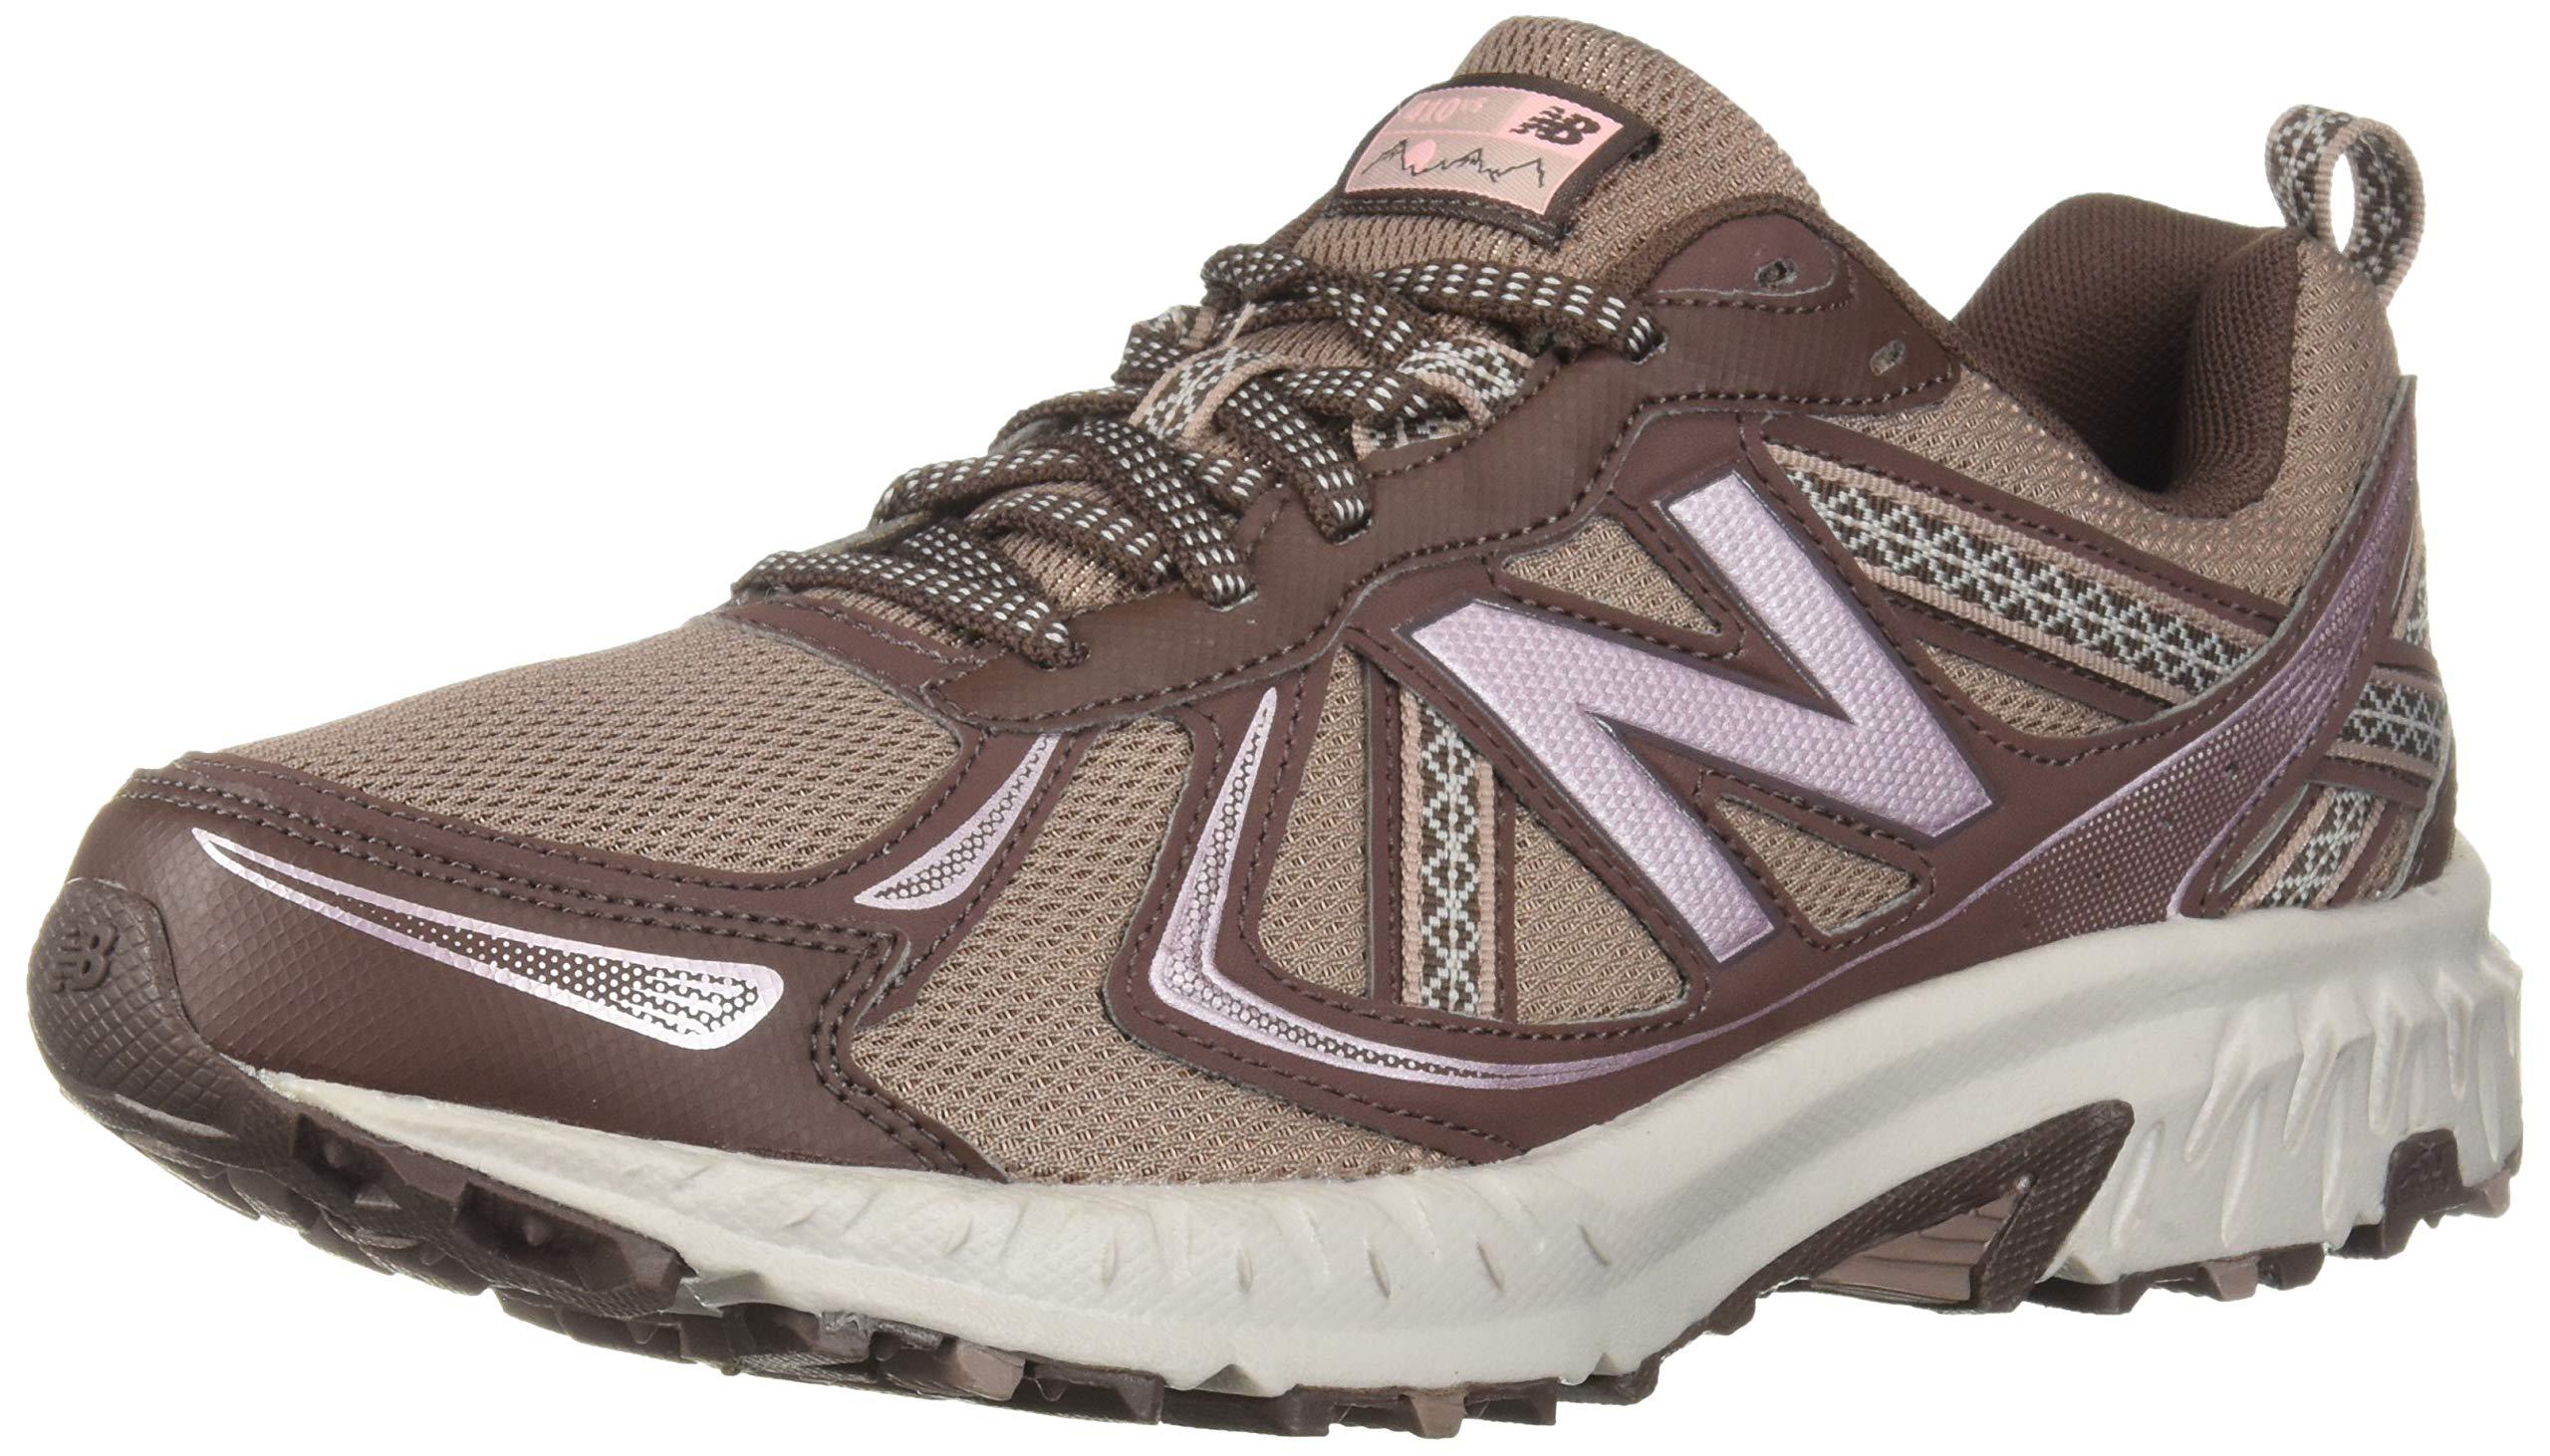 New Balance Women's 410v5 Cushioning Trail Running Shoe, Latte/Macchiatto/Himalayan Pink, 5 B US